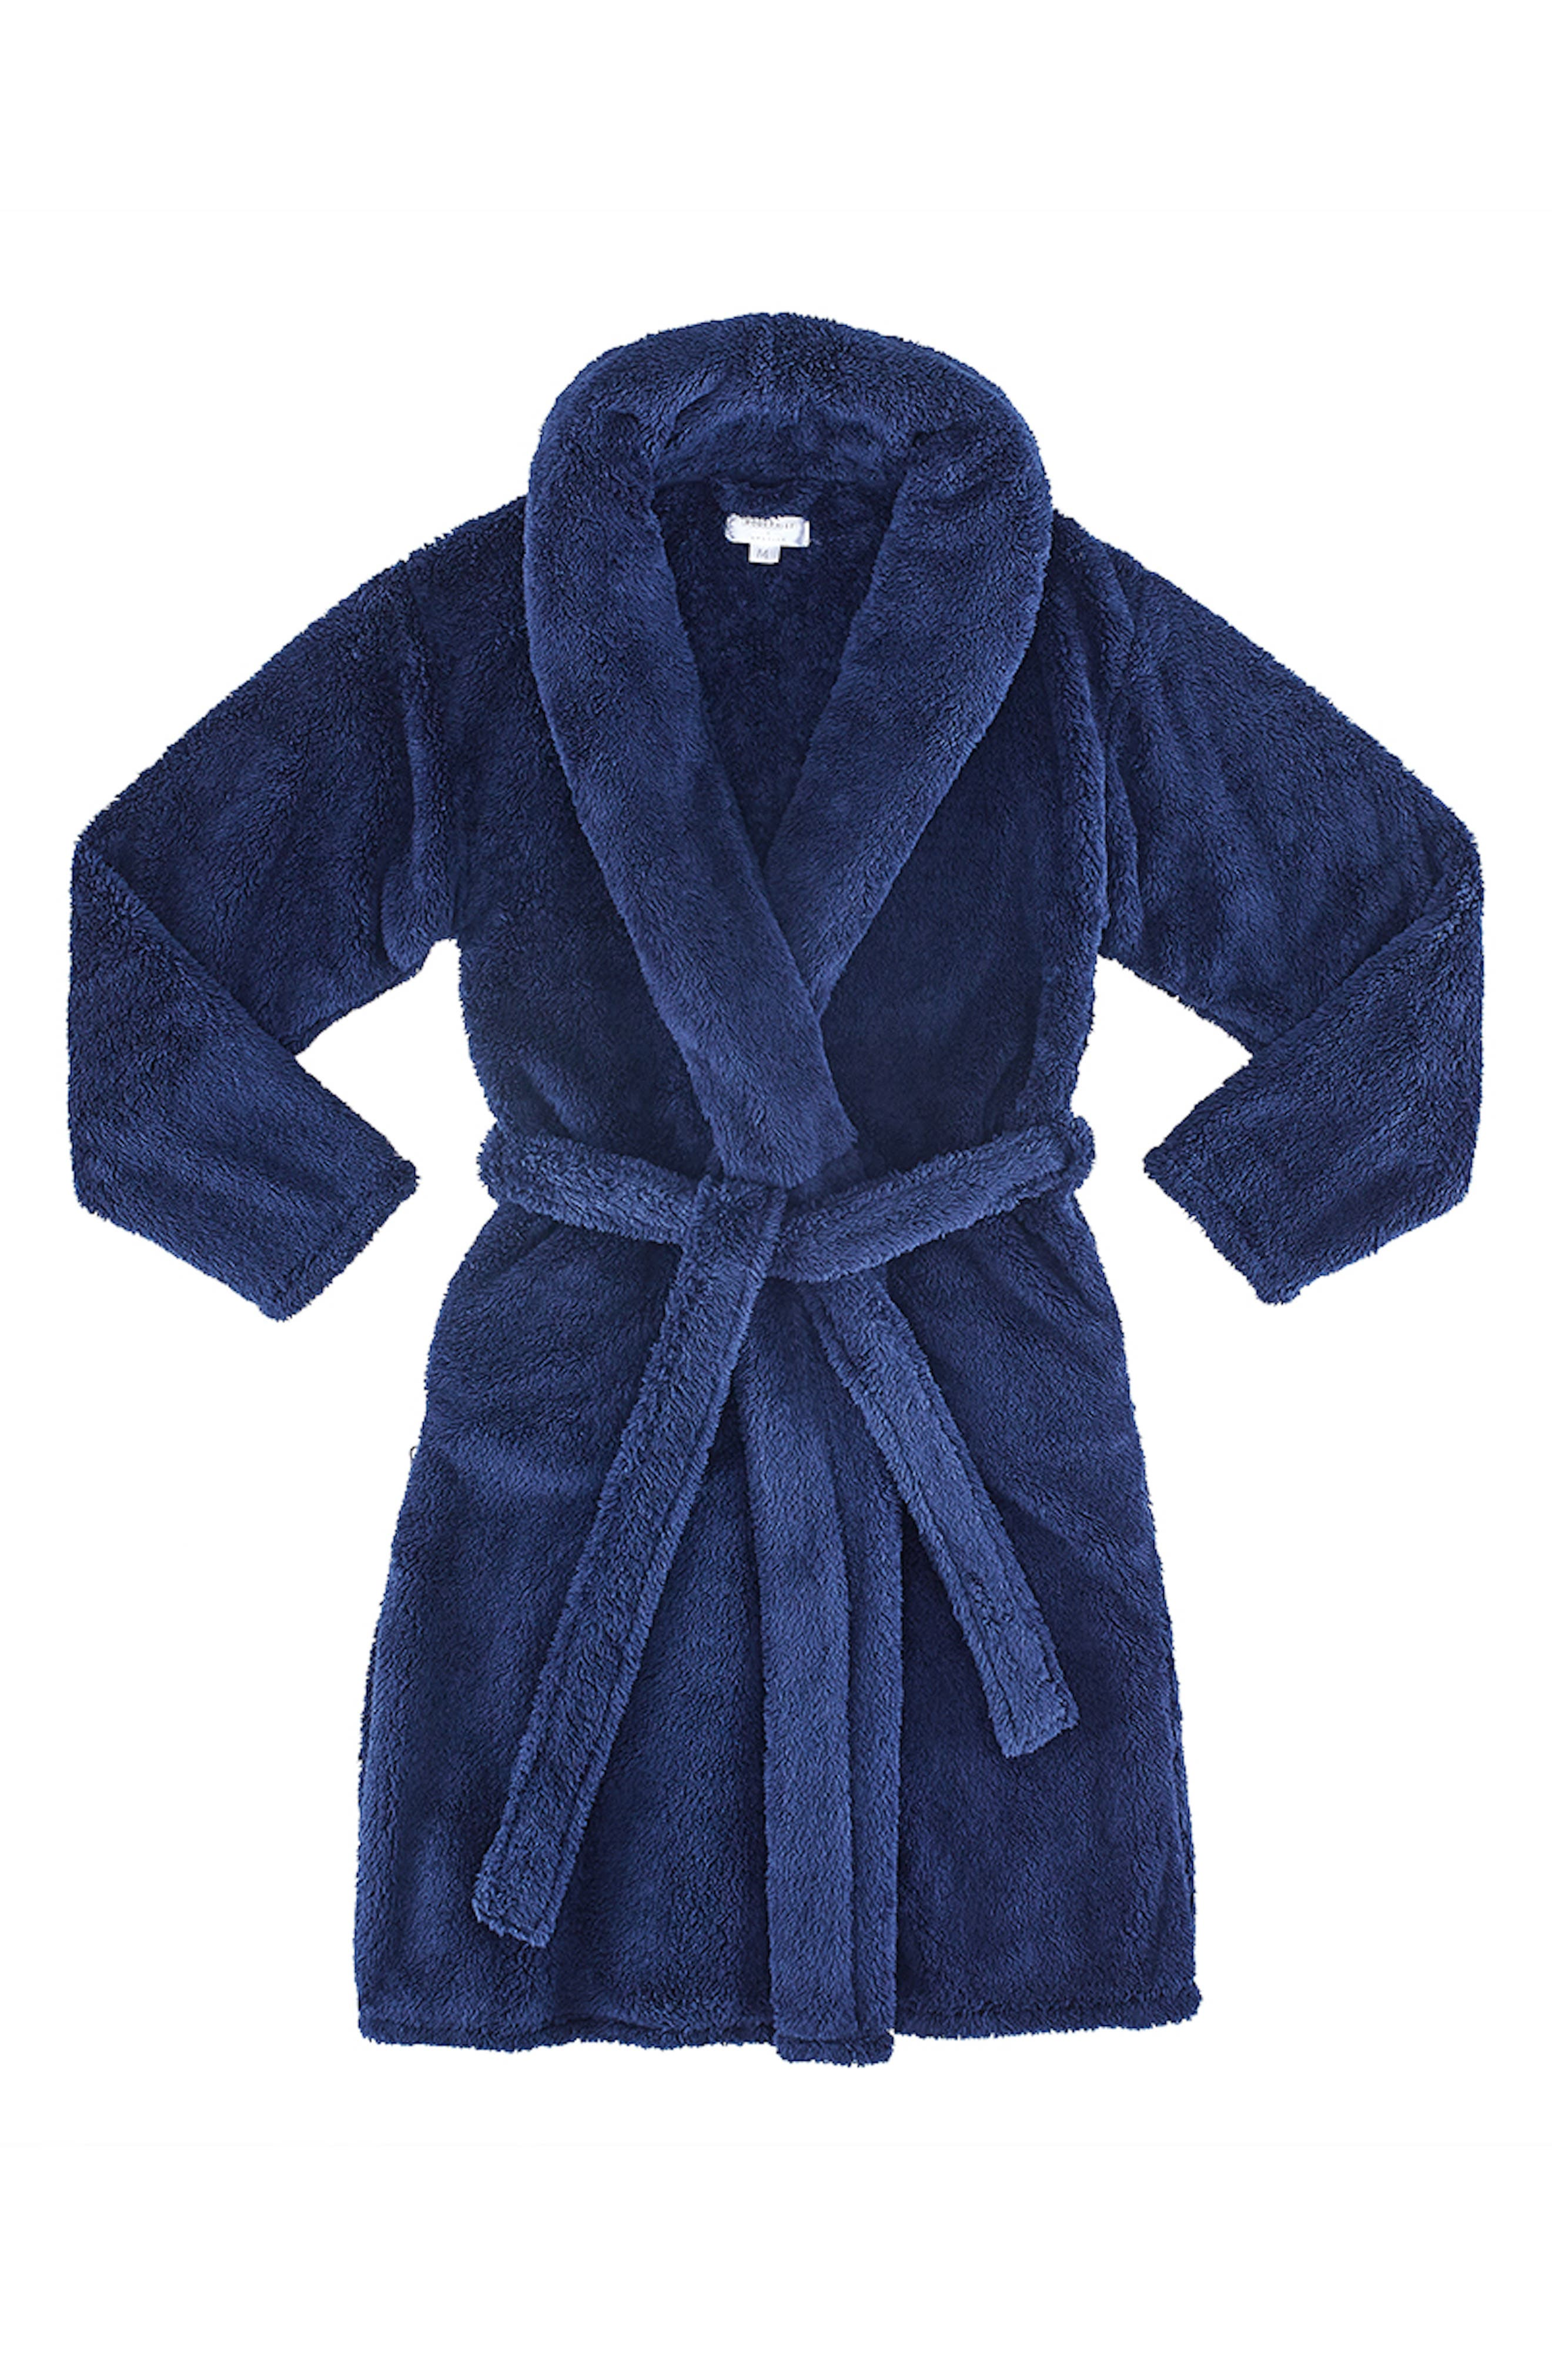 X Modernist Weighted Collar Robe